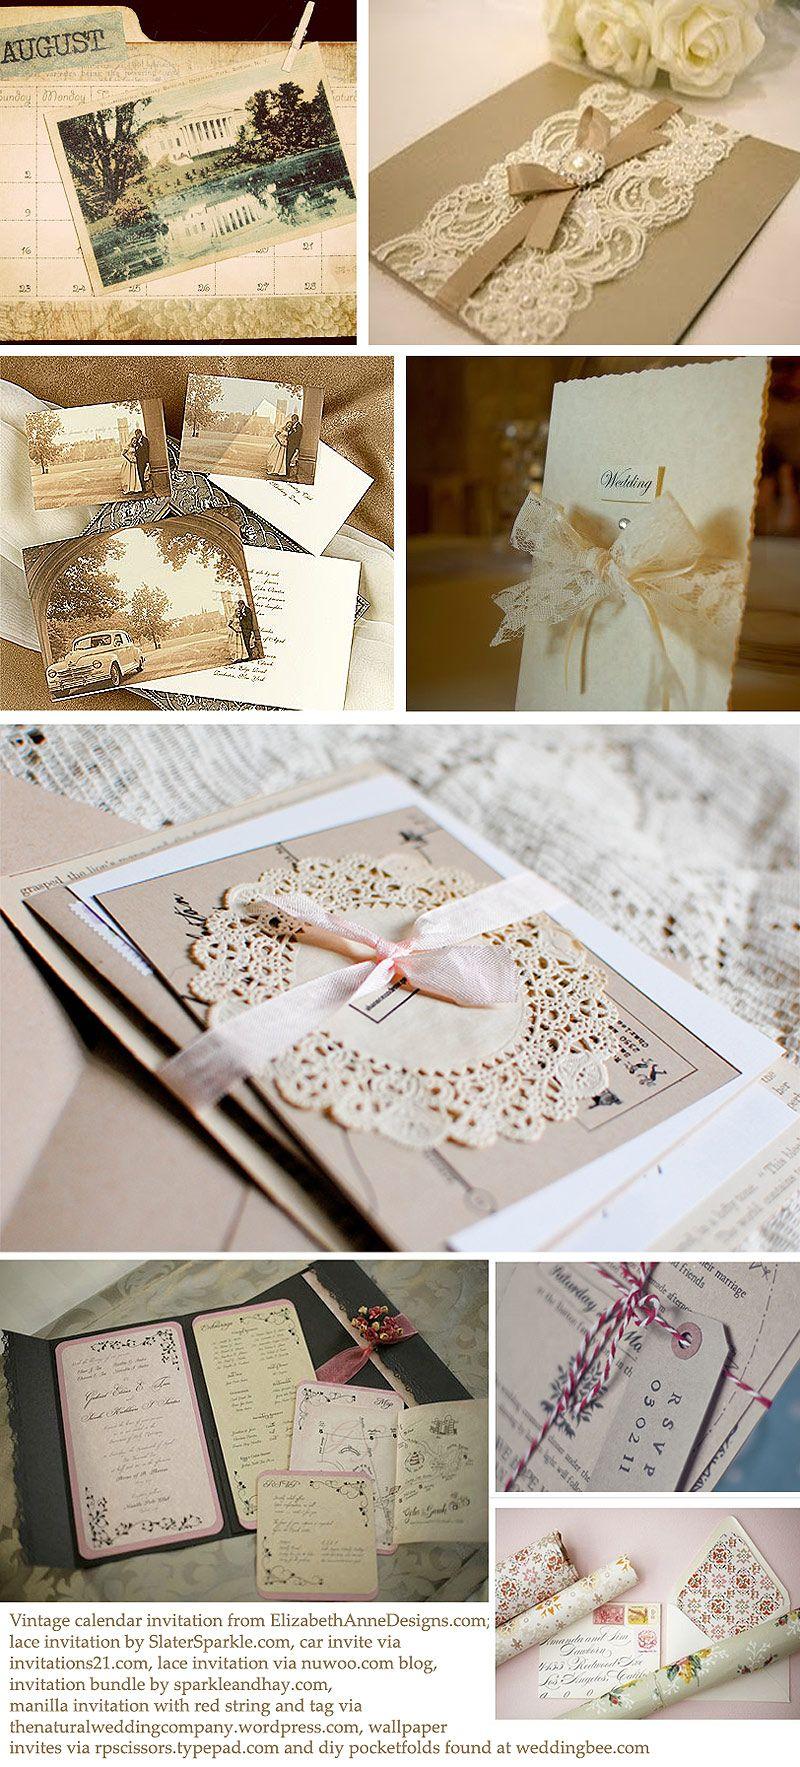 Vintage wedding vintage wedding invitations ideas for that